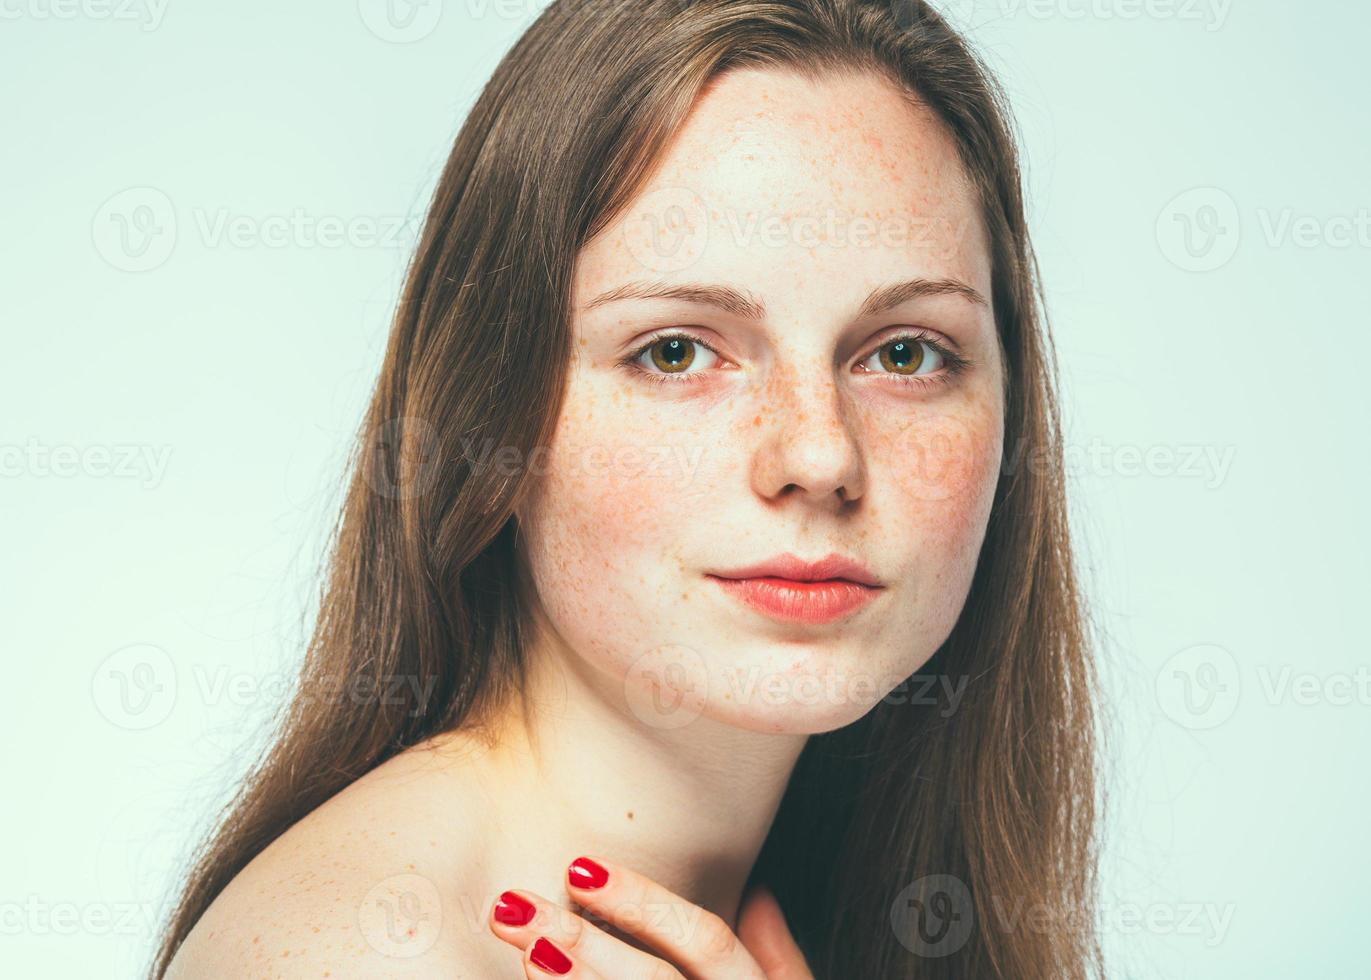 retrato de rosto de mulher bonita jovem foto